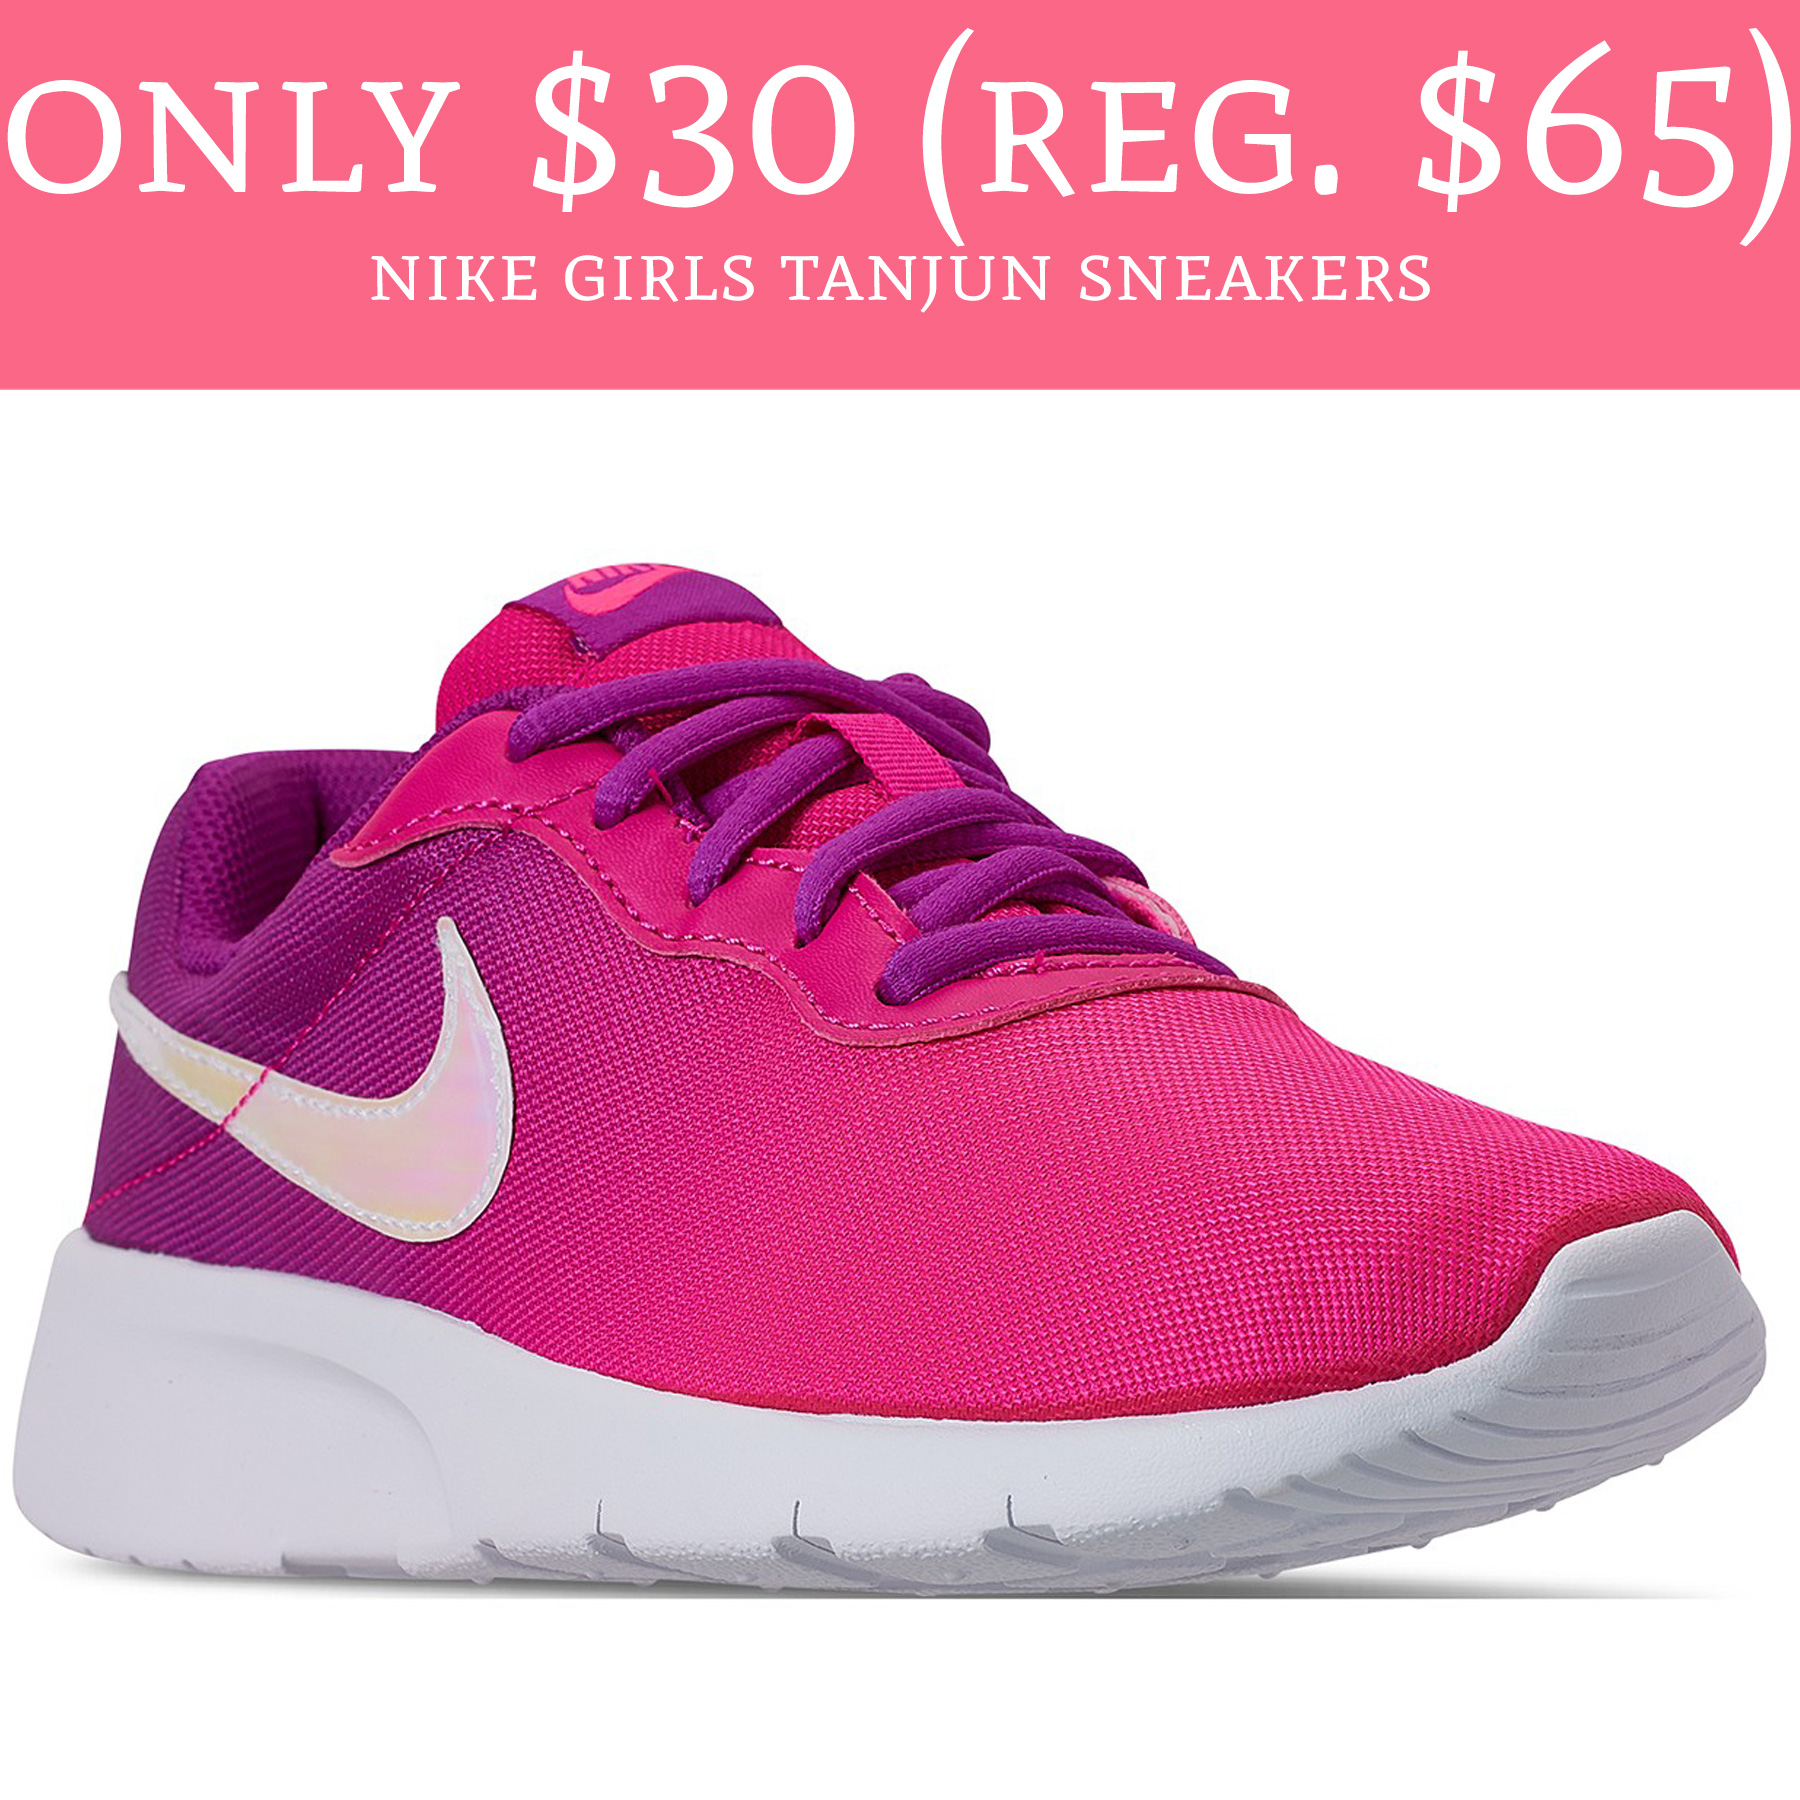 Only $30 (Regular $65) Nike Girls